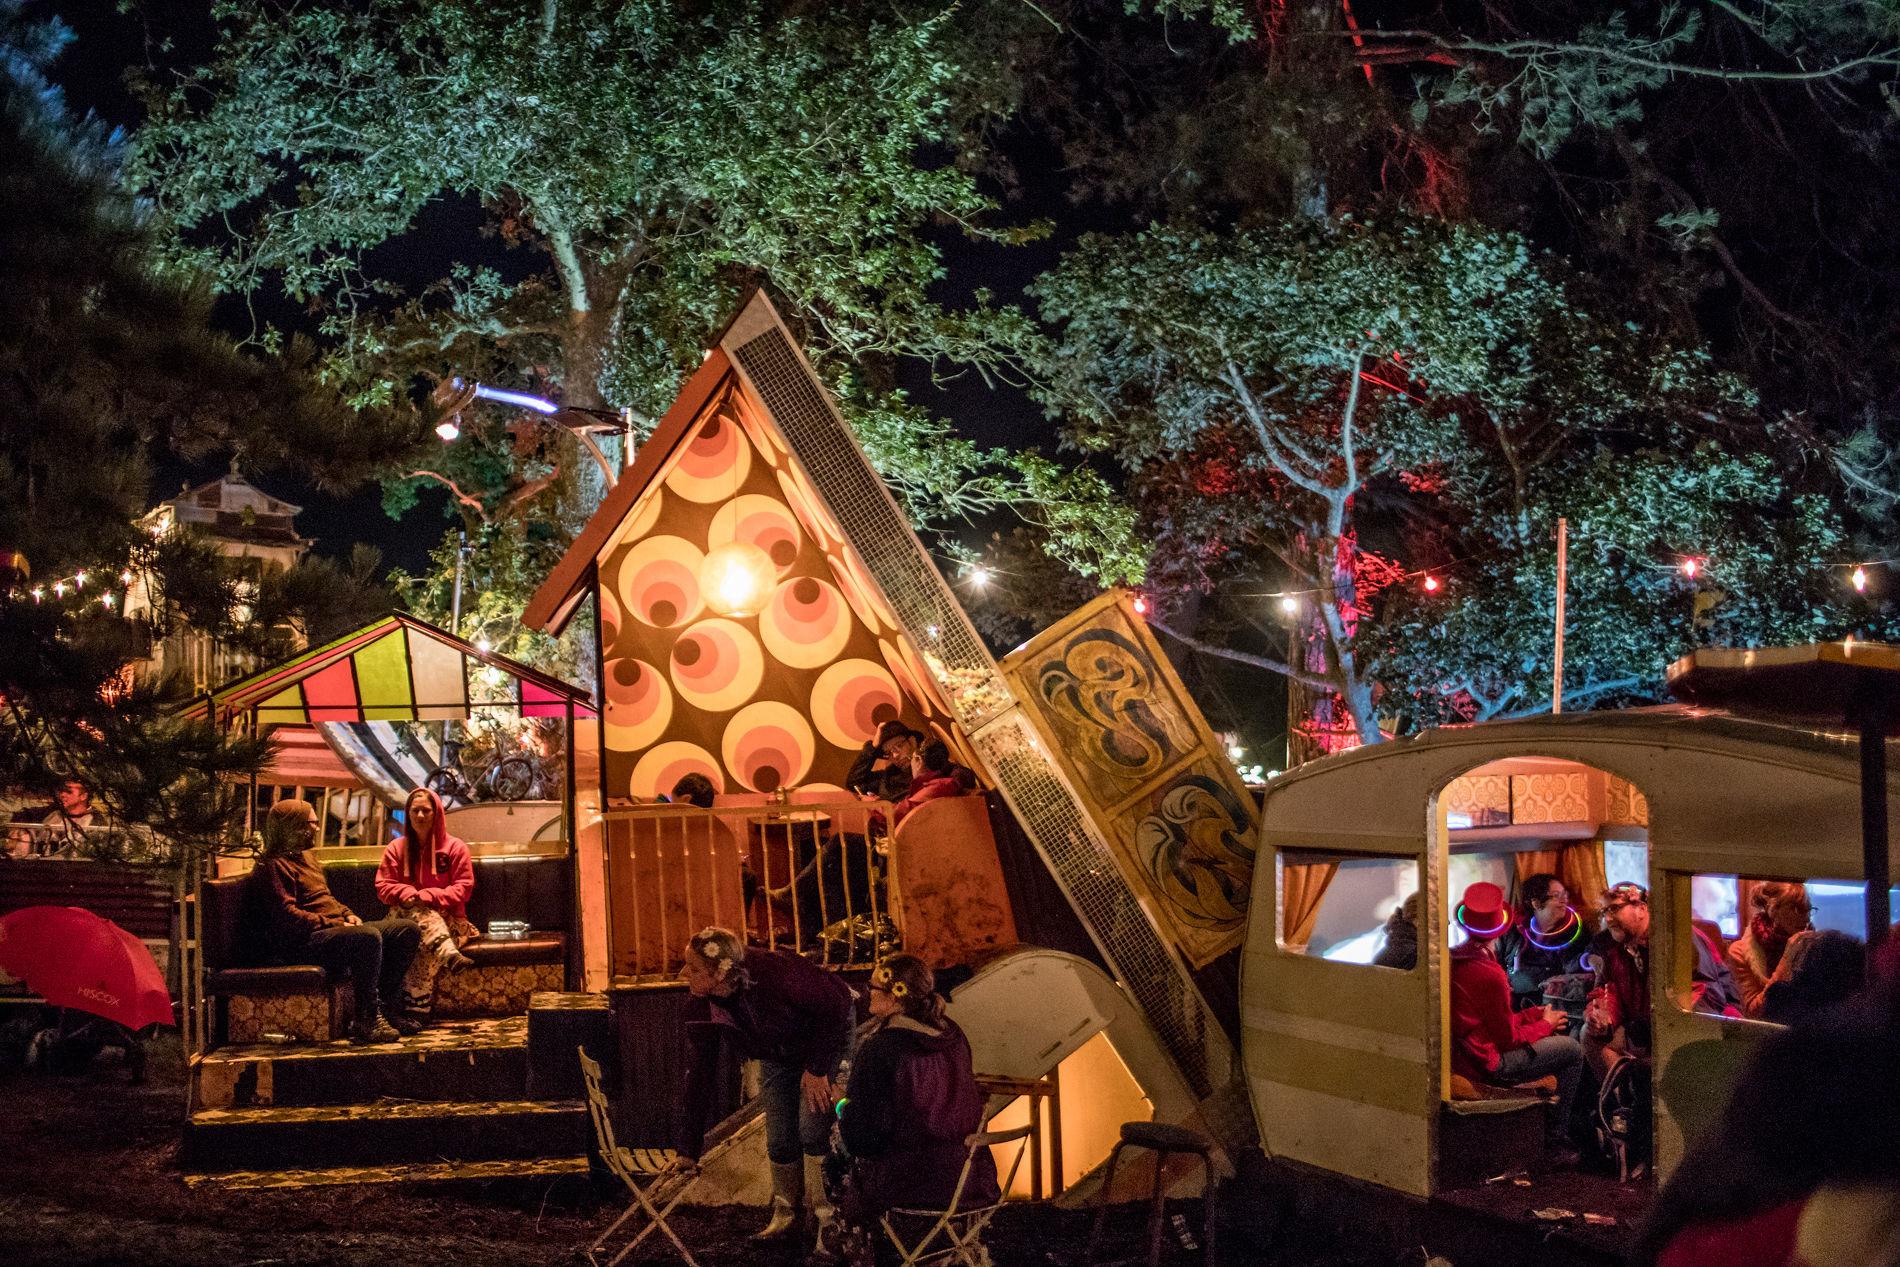 42-CampBestival2017-DisneyRascal-CL-VIC_8011.jpg